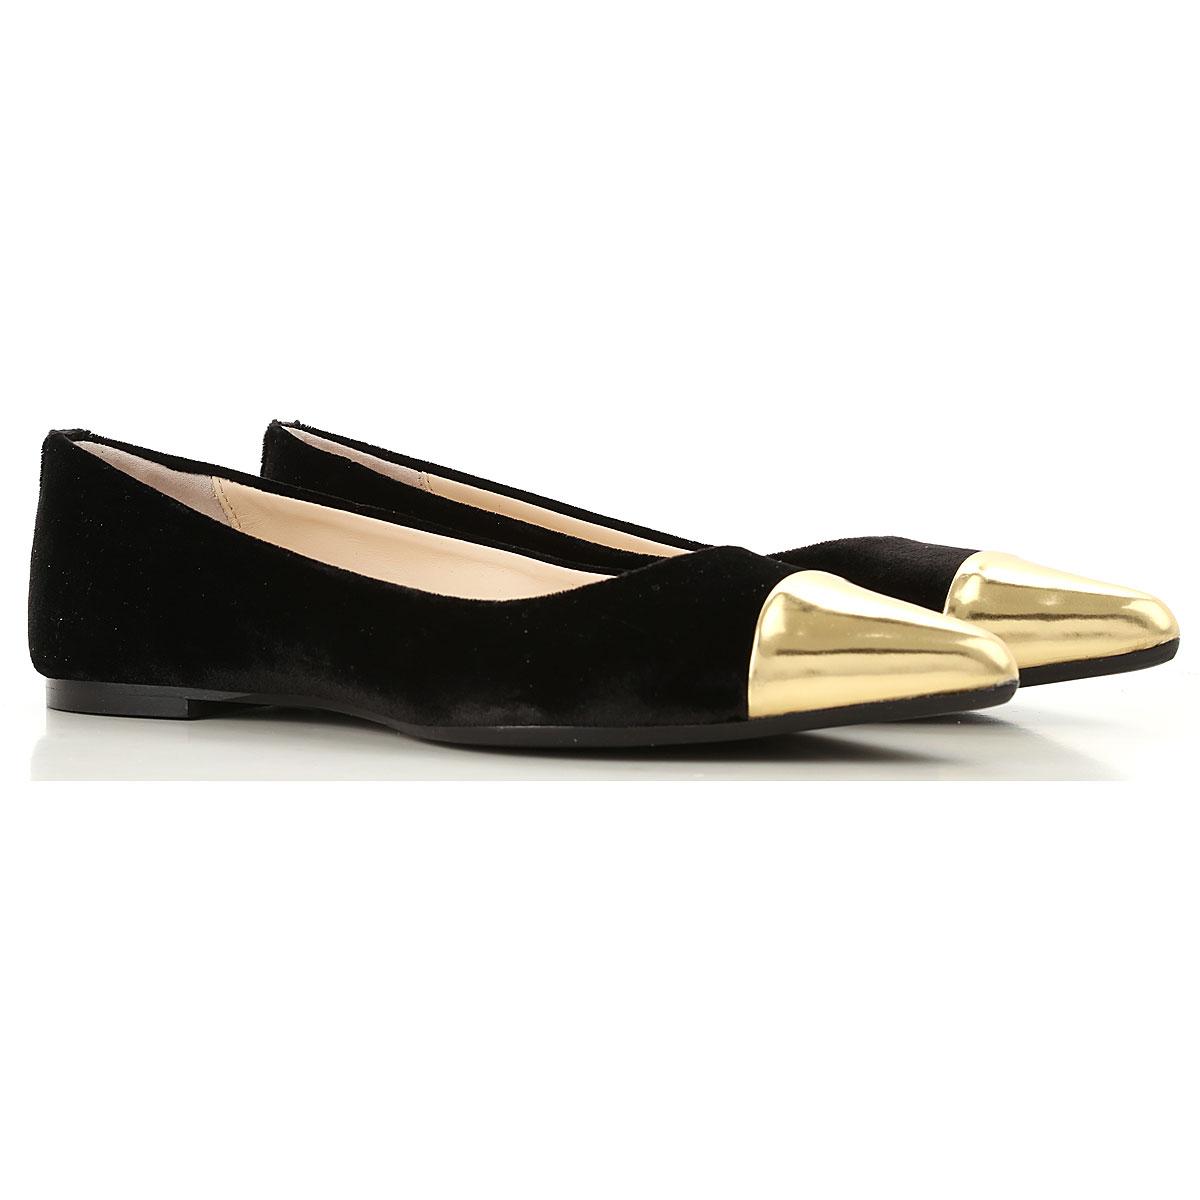 Image of Anna Baiguera Ballet Flats Ballerina Shoes for Women, Black, Velvet, 2017, 10 11 5 6 7 8